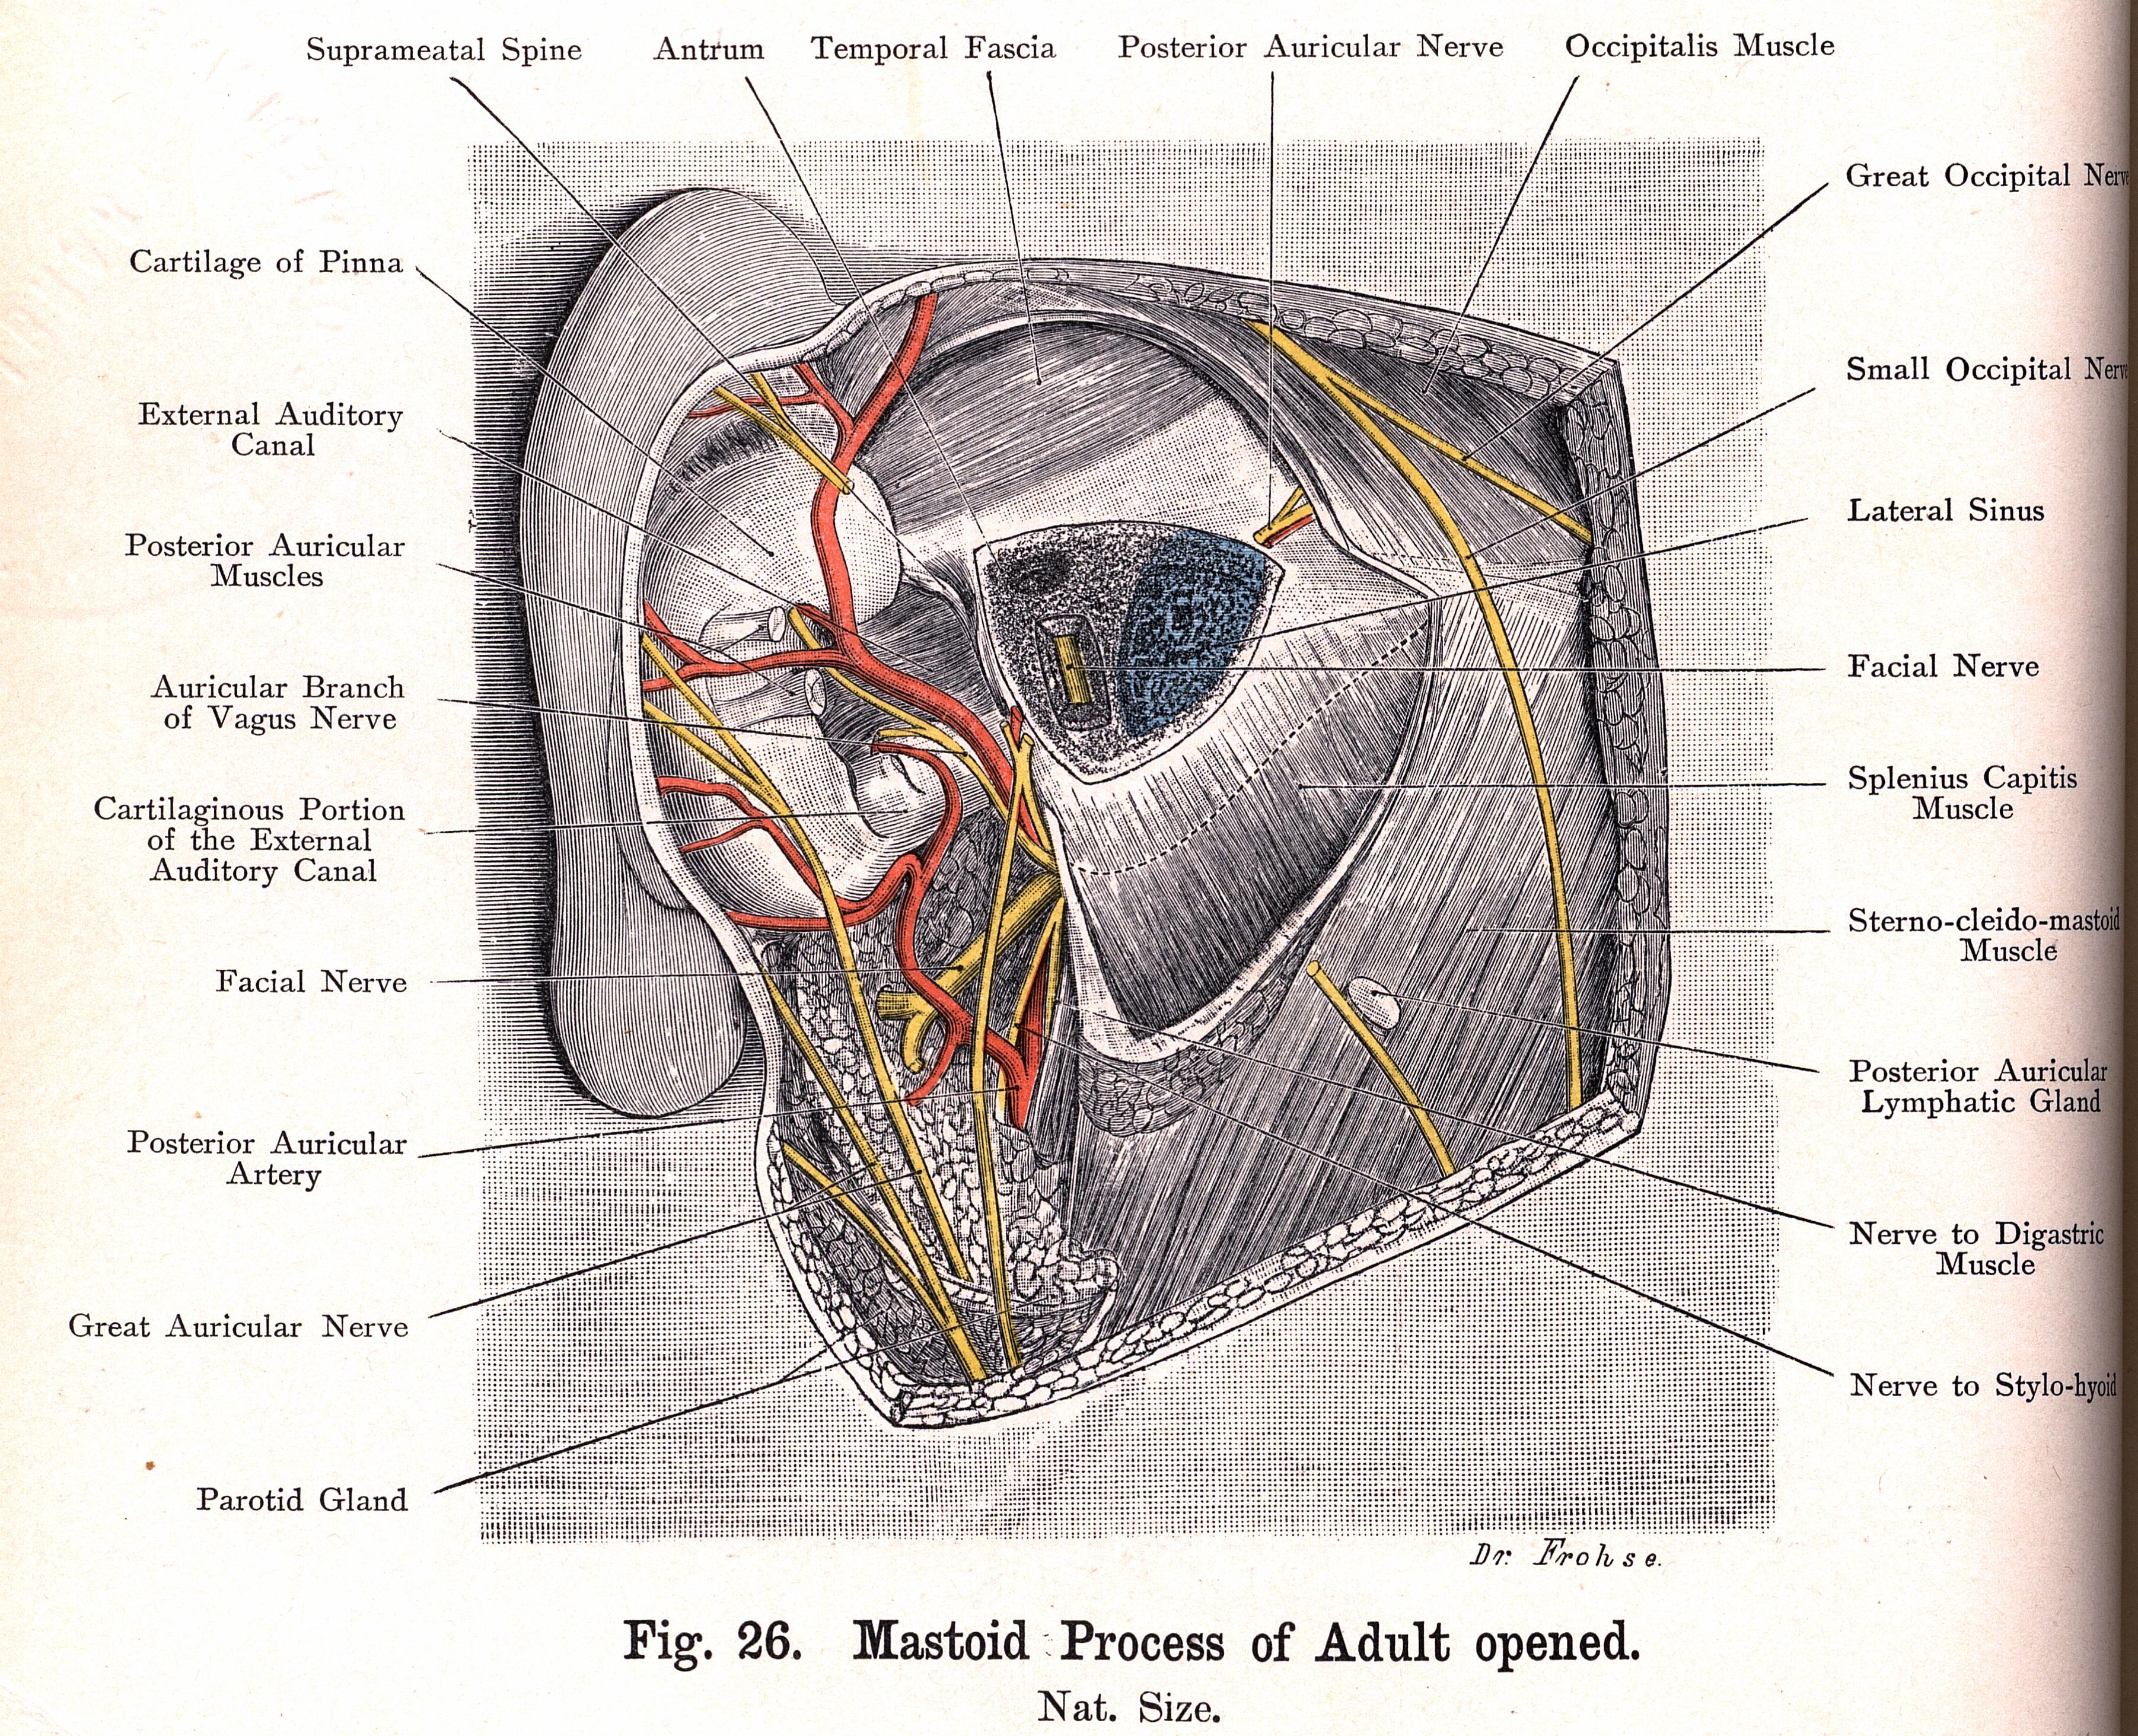 bardeleben_26?sequence=1&isAllowed=y 26 mastoid process of adult opened